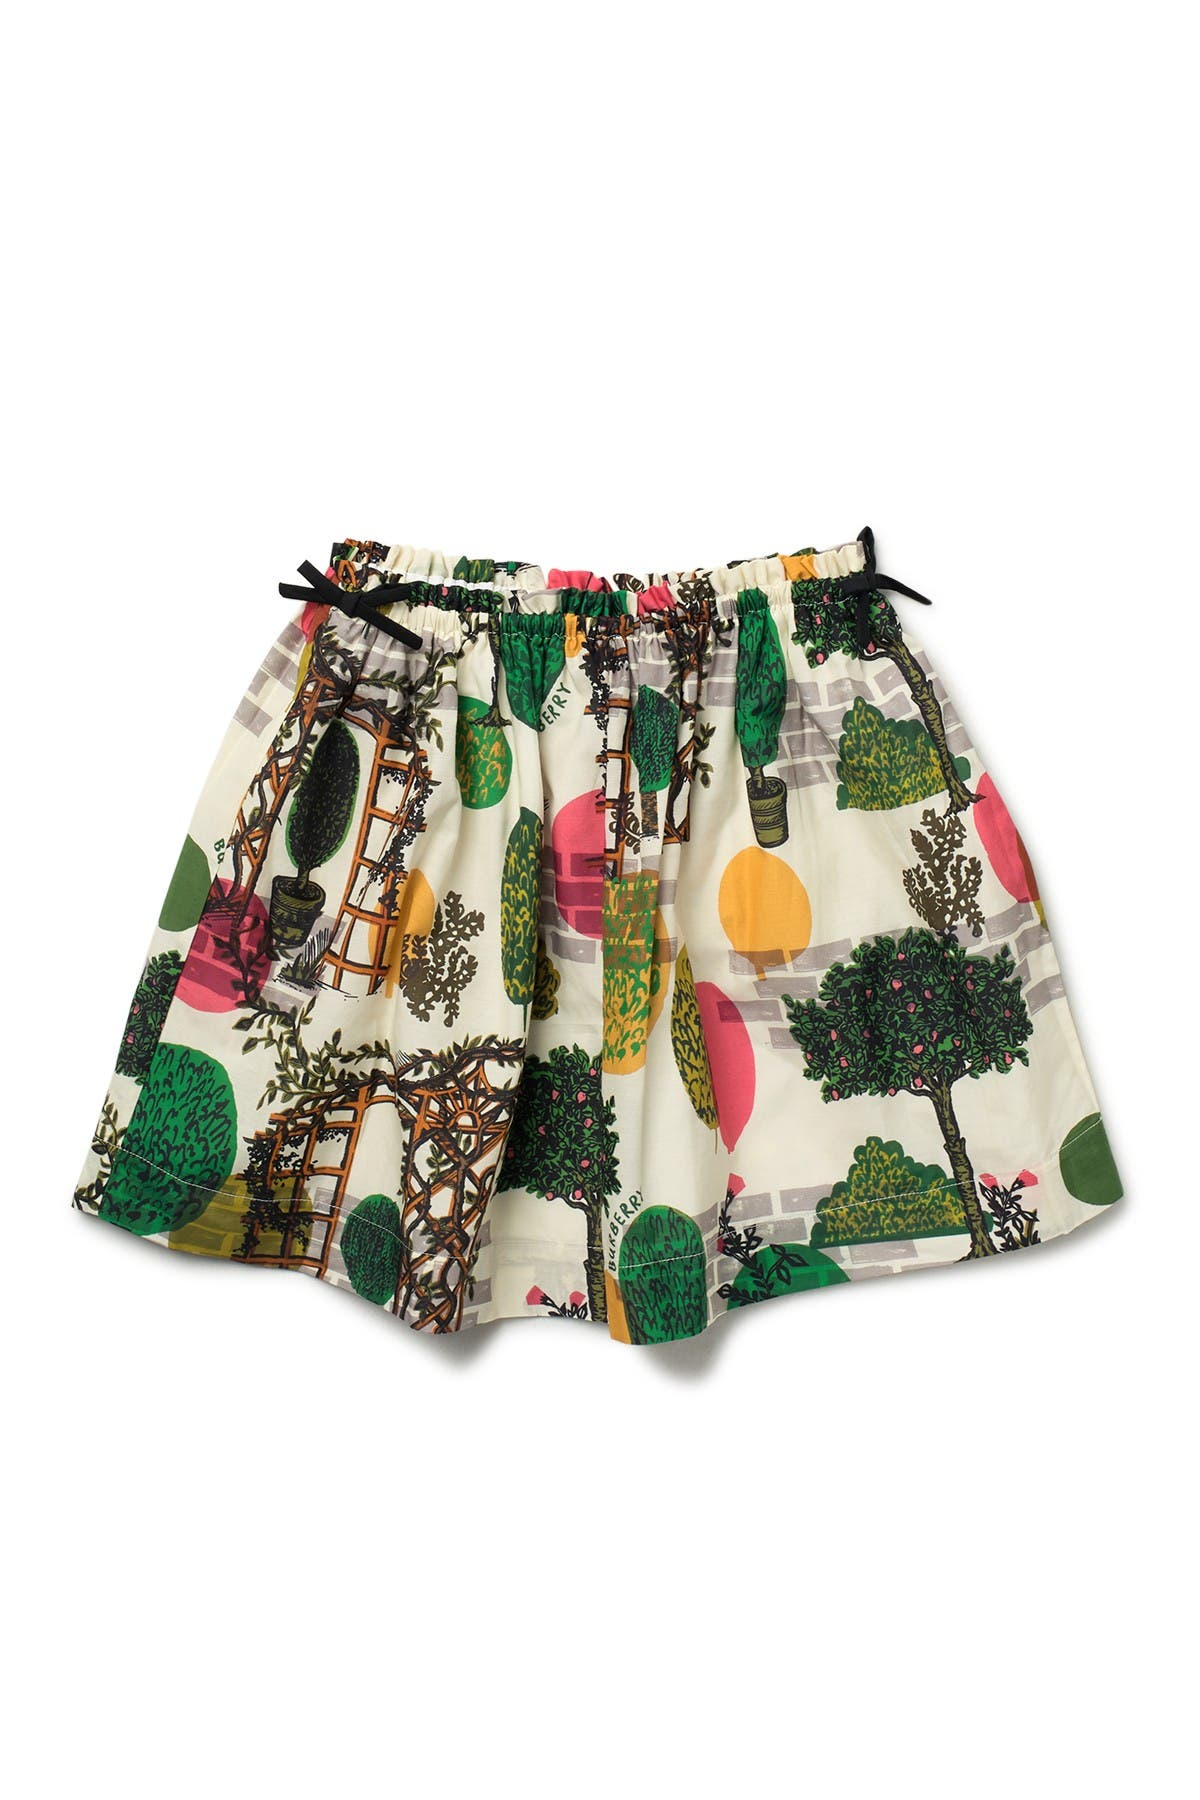 Image of Burberry Kendil Garden Skirt